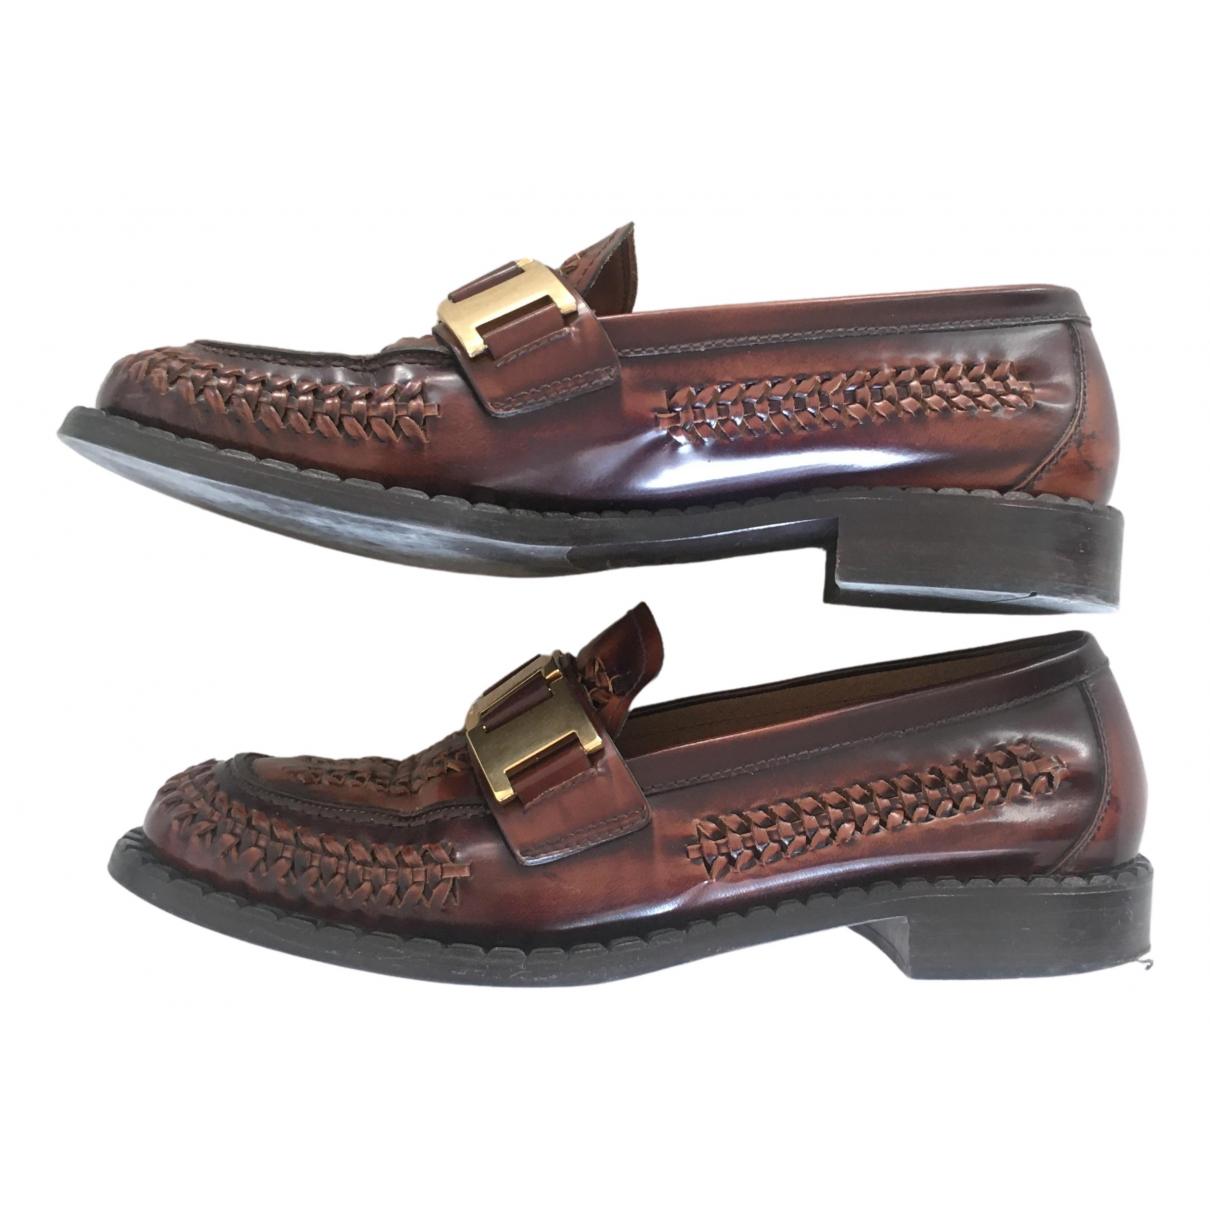 Prada \N Brown Leather Flats for Women 40 EU